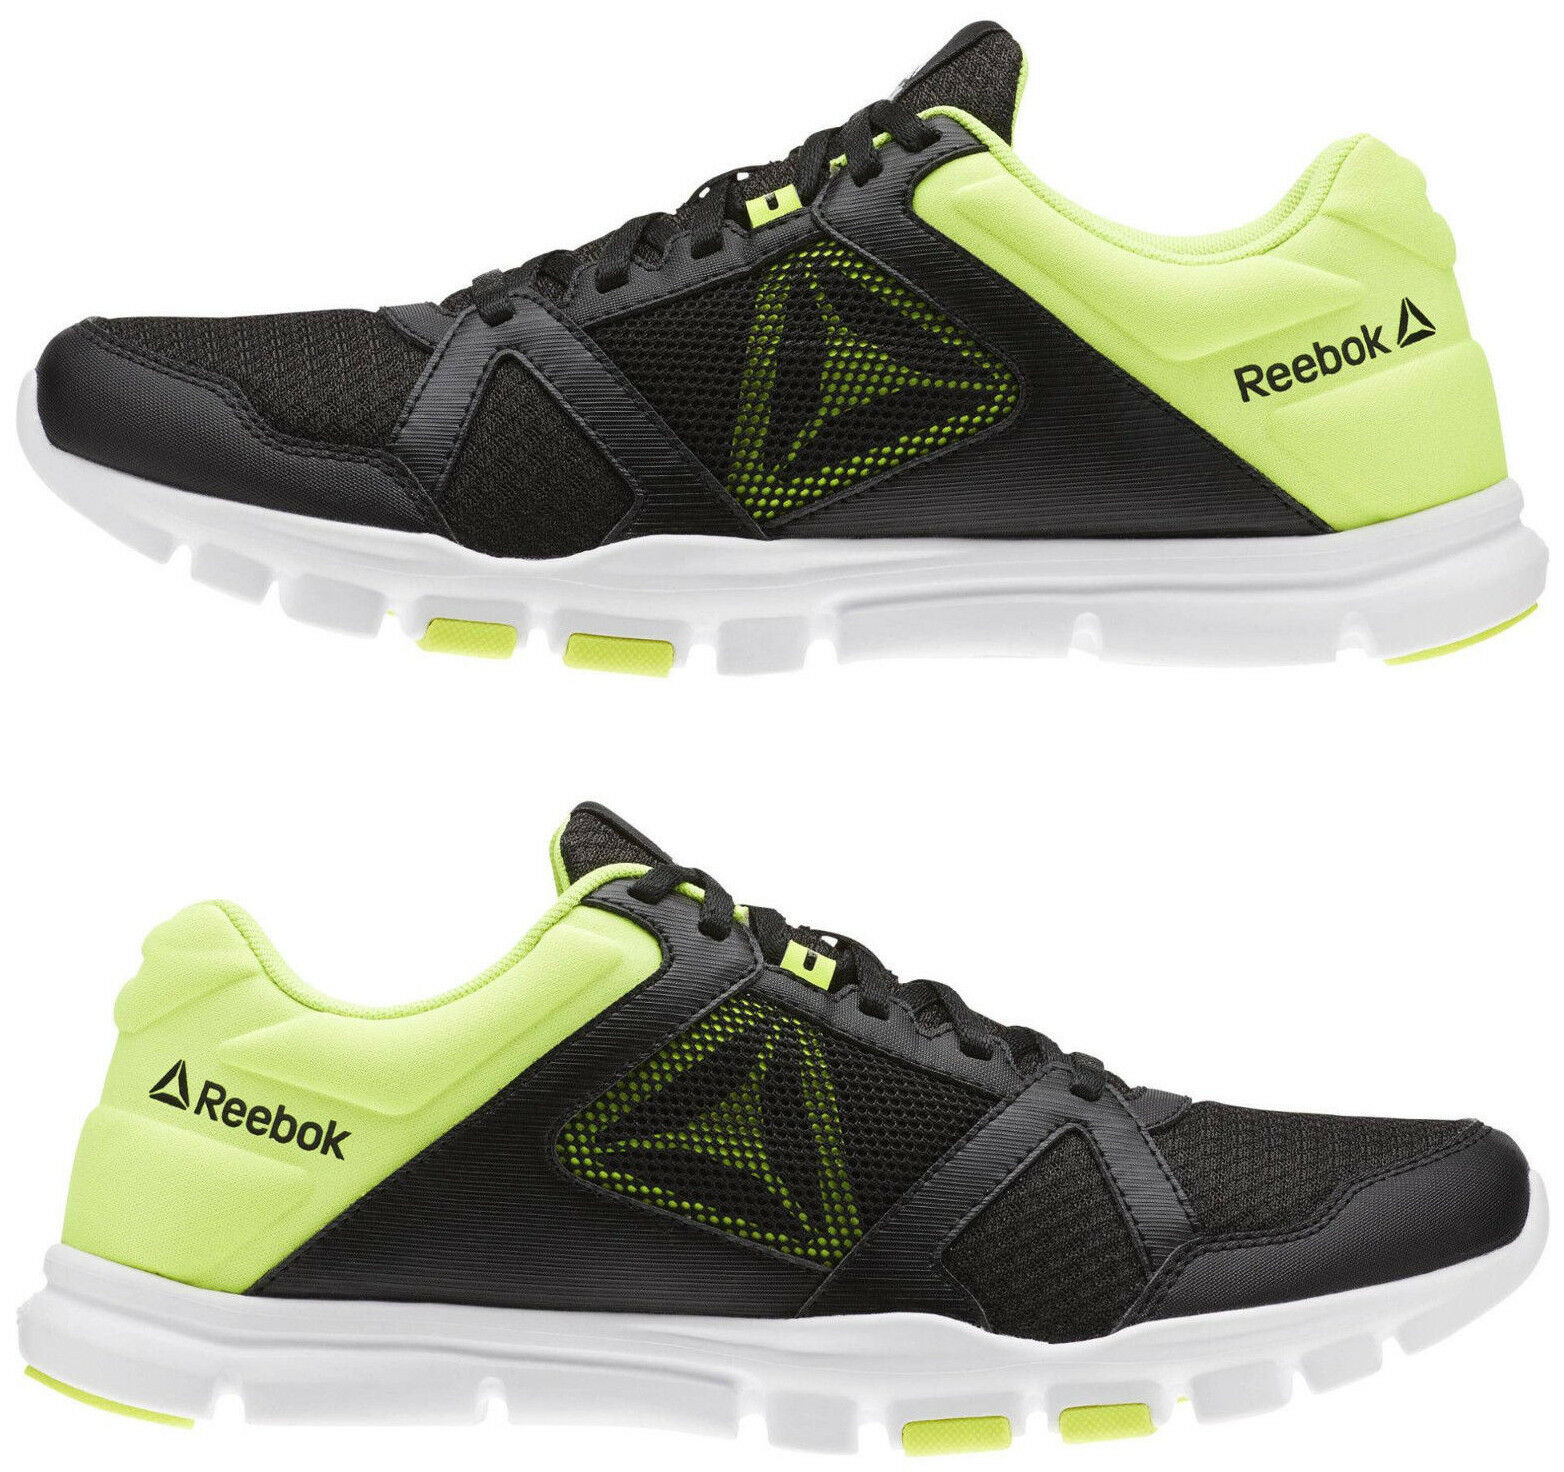 Reebok Men MT Flexible Schuhes Gym Training Yourflex Train 10 MT Men Fitness CN4728 New 27a3d5